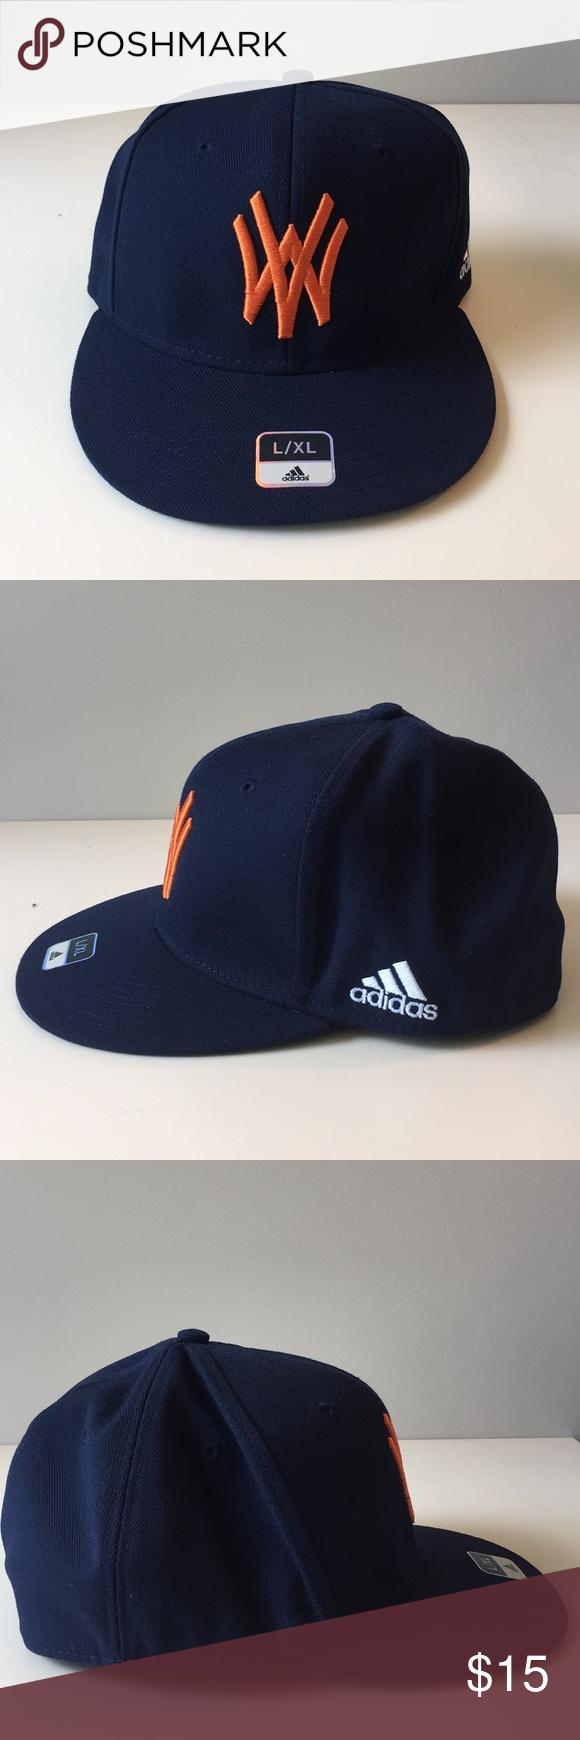 Nwot Adidas West Virginia Baseball Cap L Xl Clothes Design Fashion Design Blue Adidas